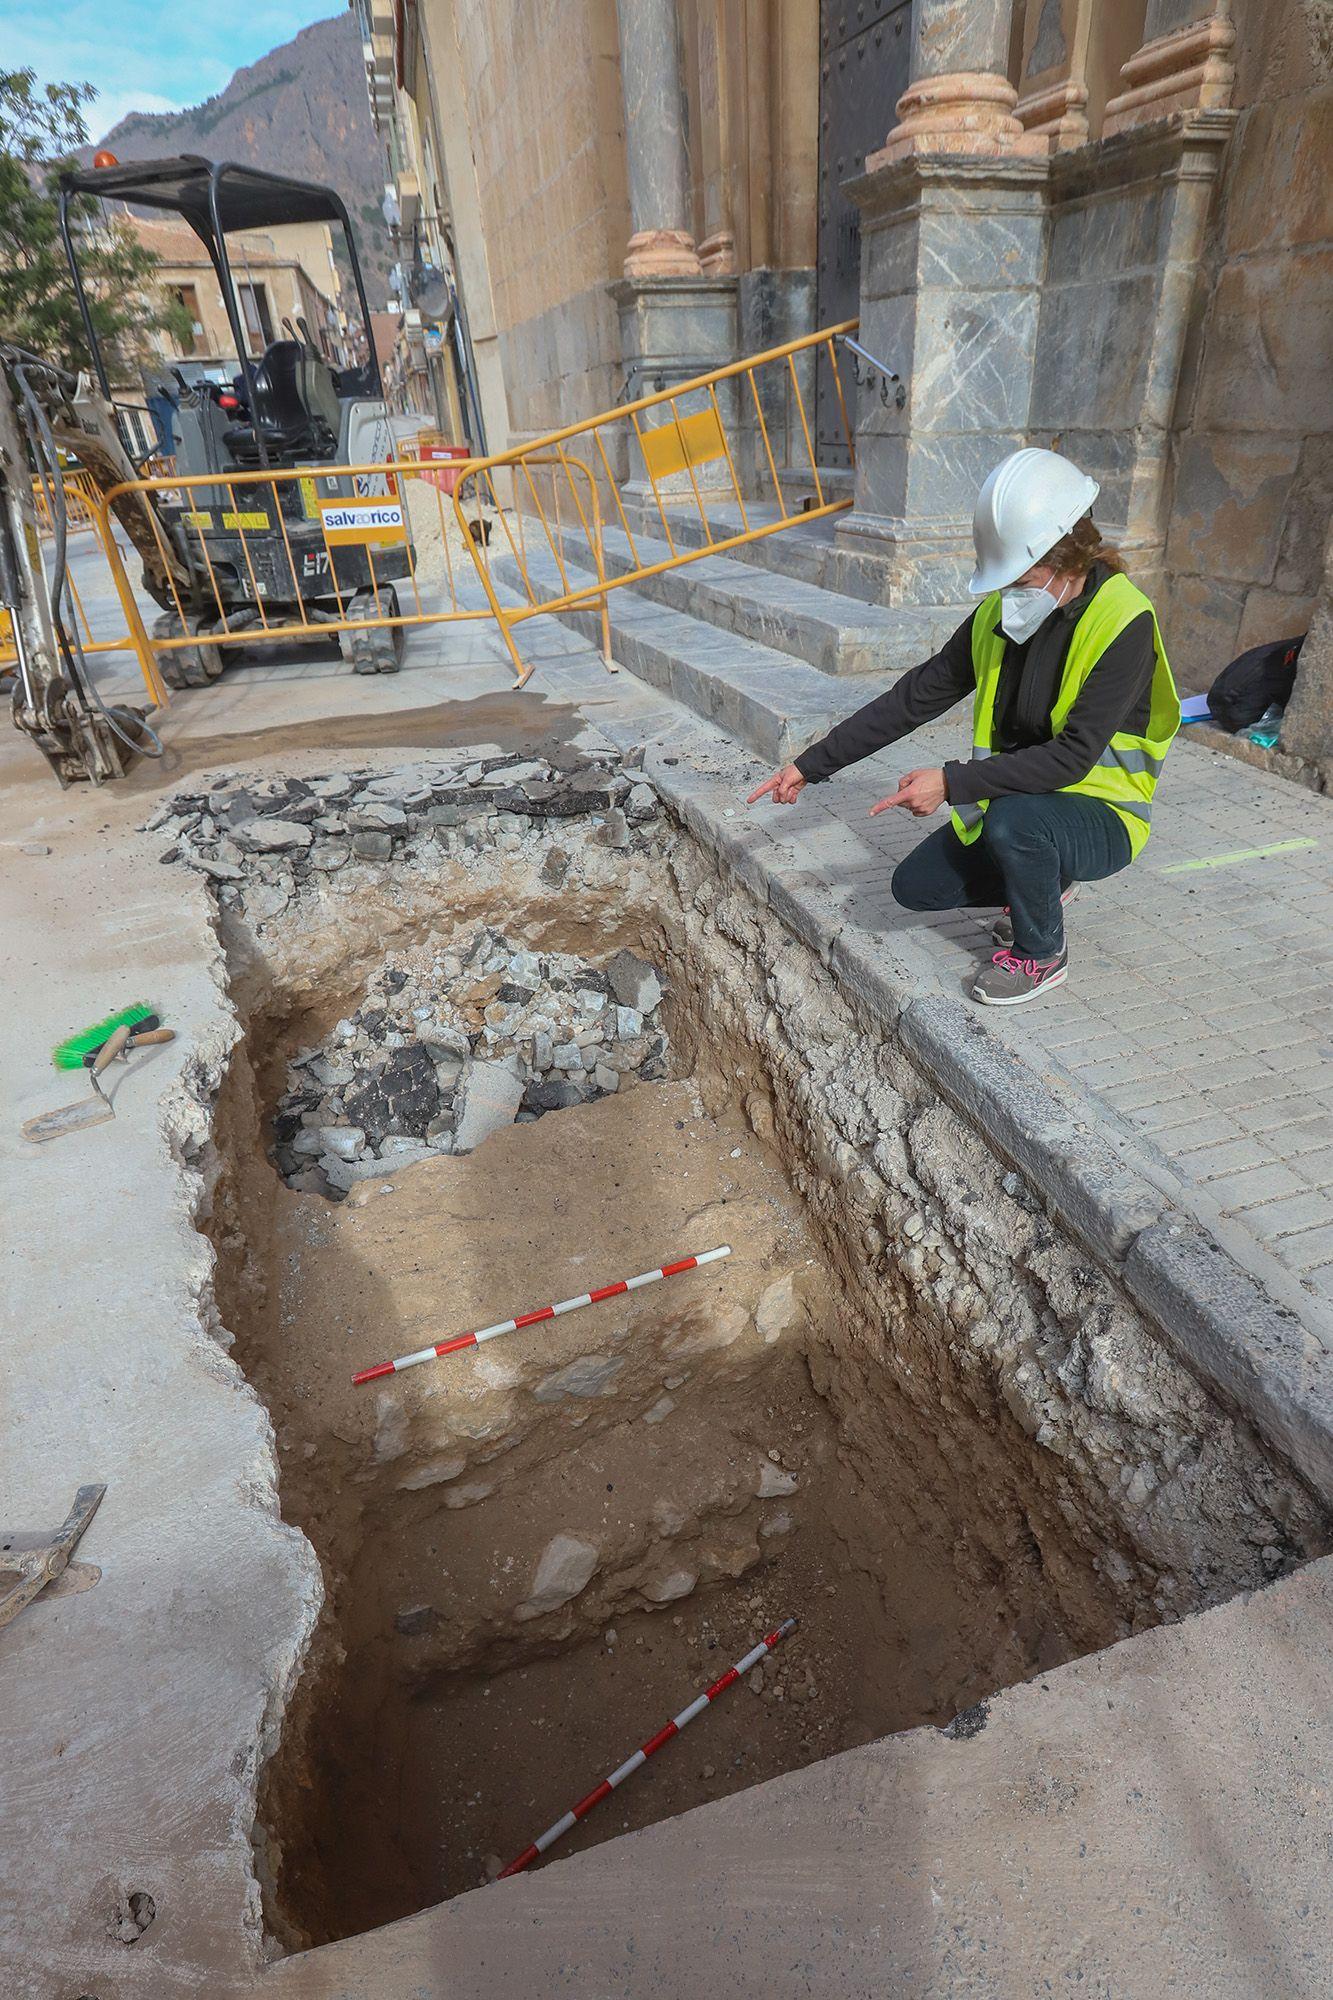 Localizan junto al Santuario de Monserrate una parte de la muralla islámica de Orihuela